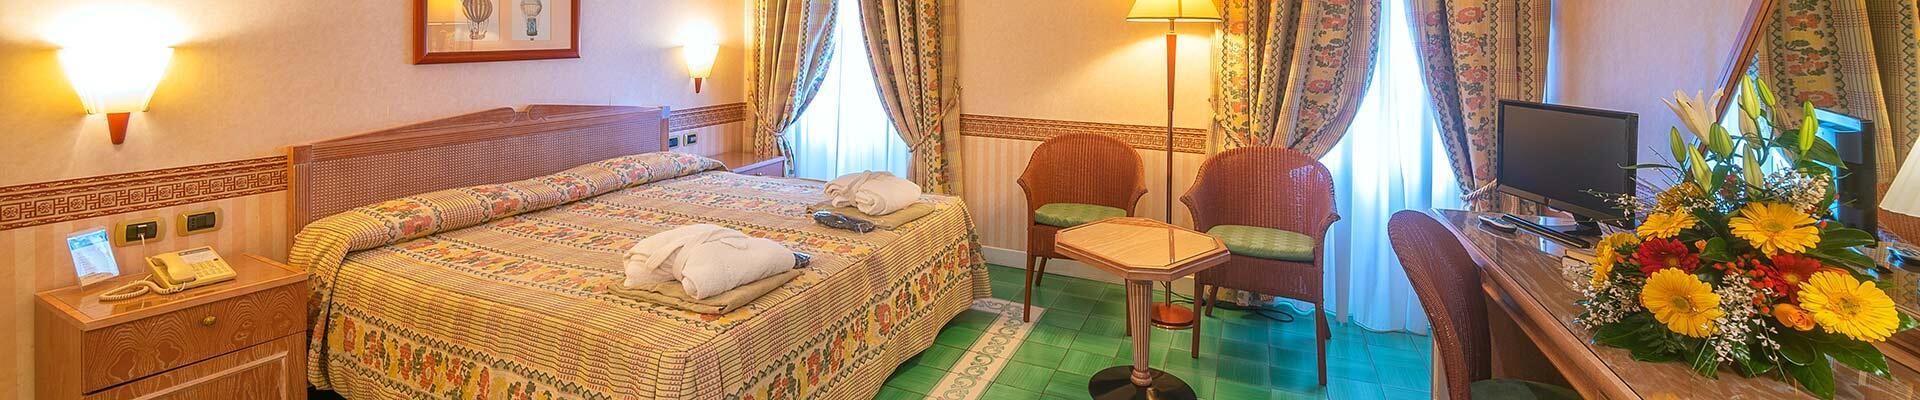 hotelreferdinandoischia it listino-prezzi 004